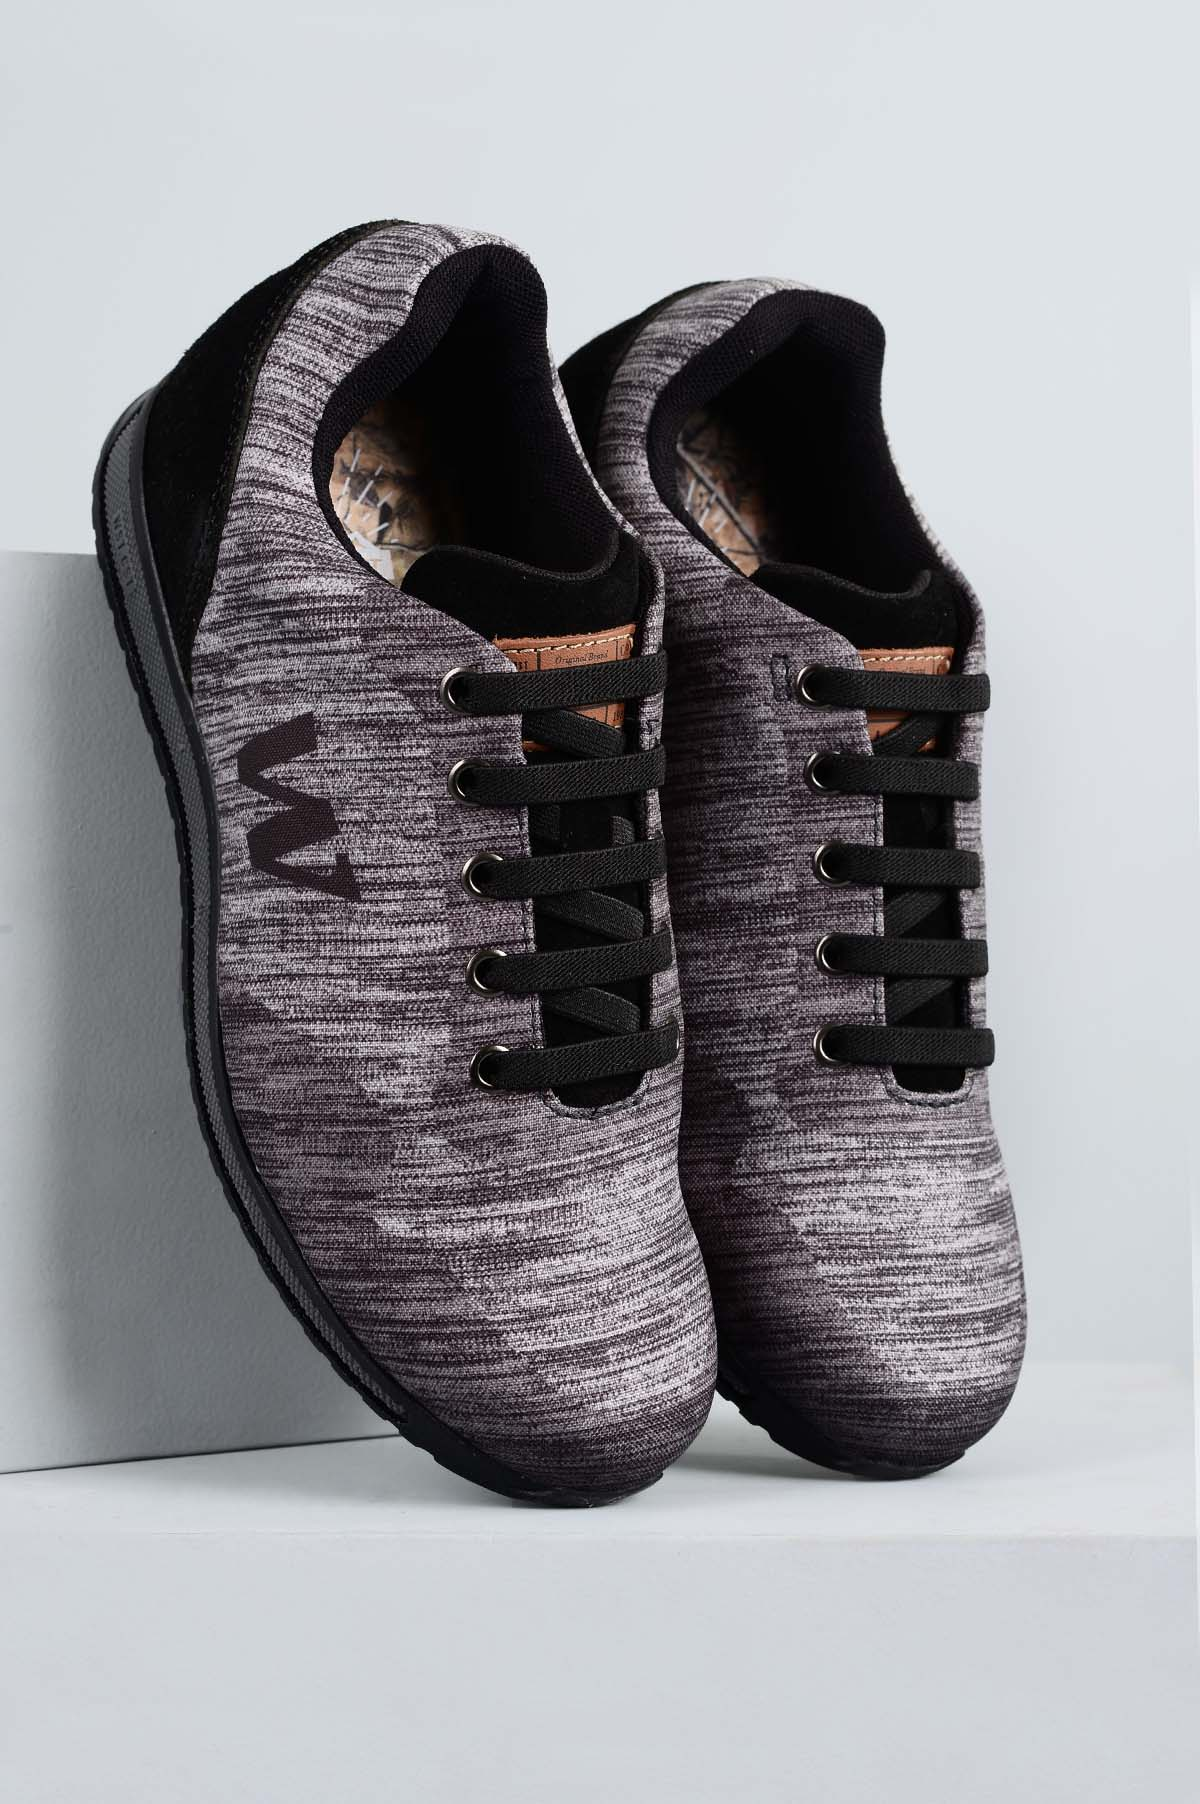 74b4267bc005b Sapatênis West Coast Joplin SINT - PRETO - Mundial Calçados